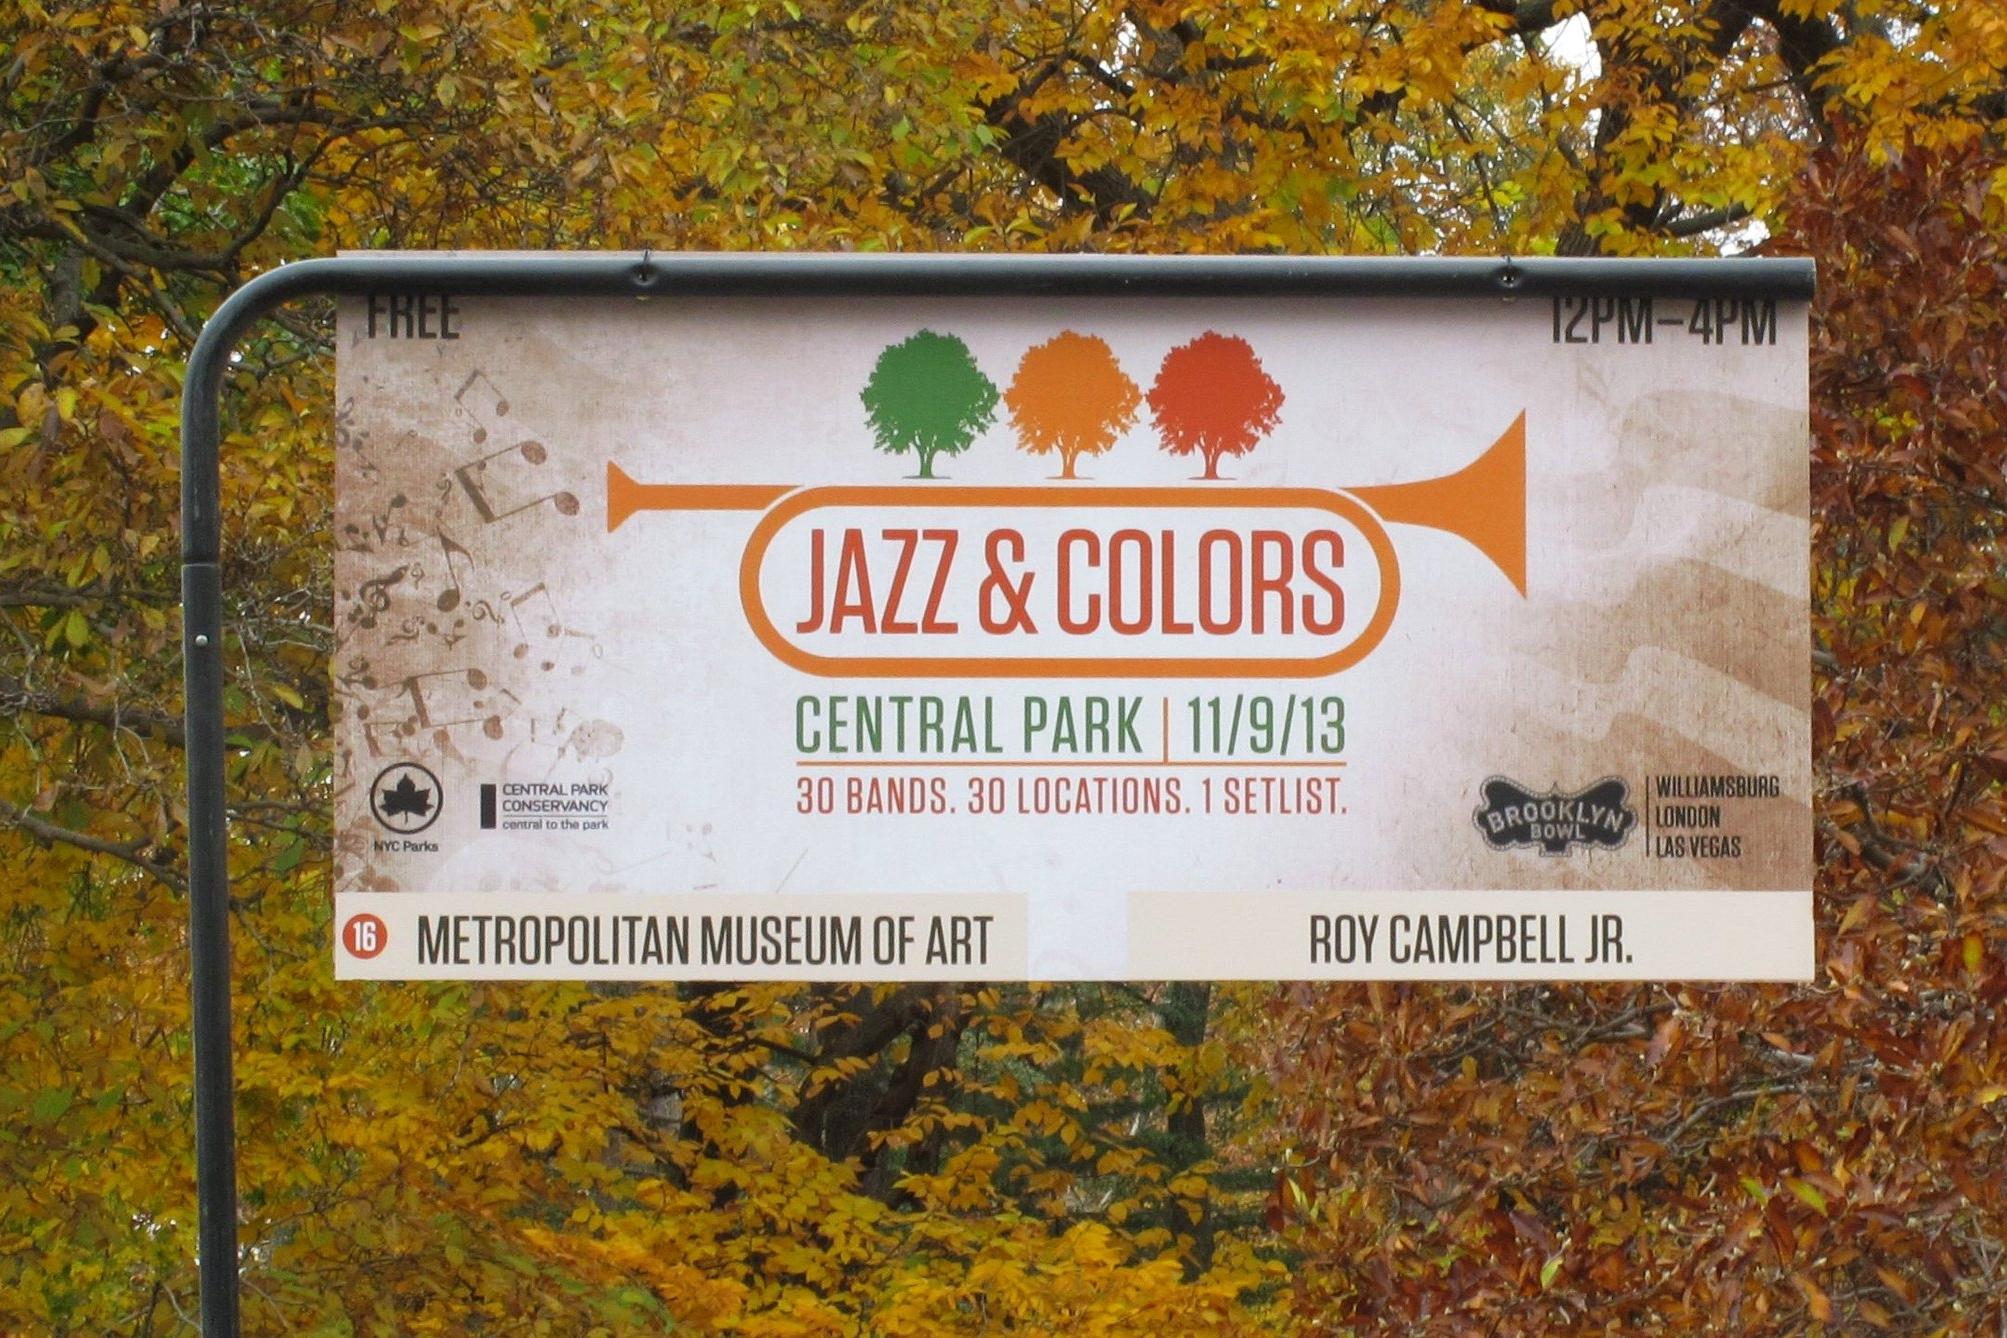 JazzAndColors_APCG3.JPG